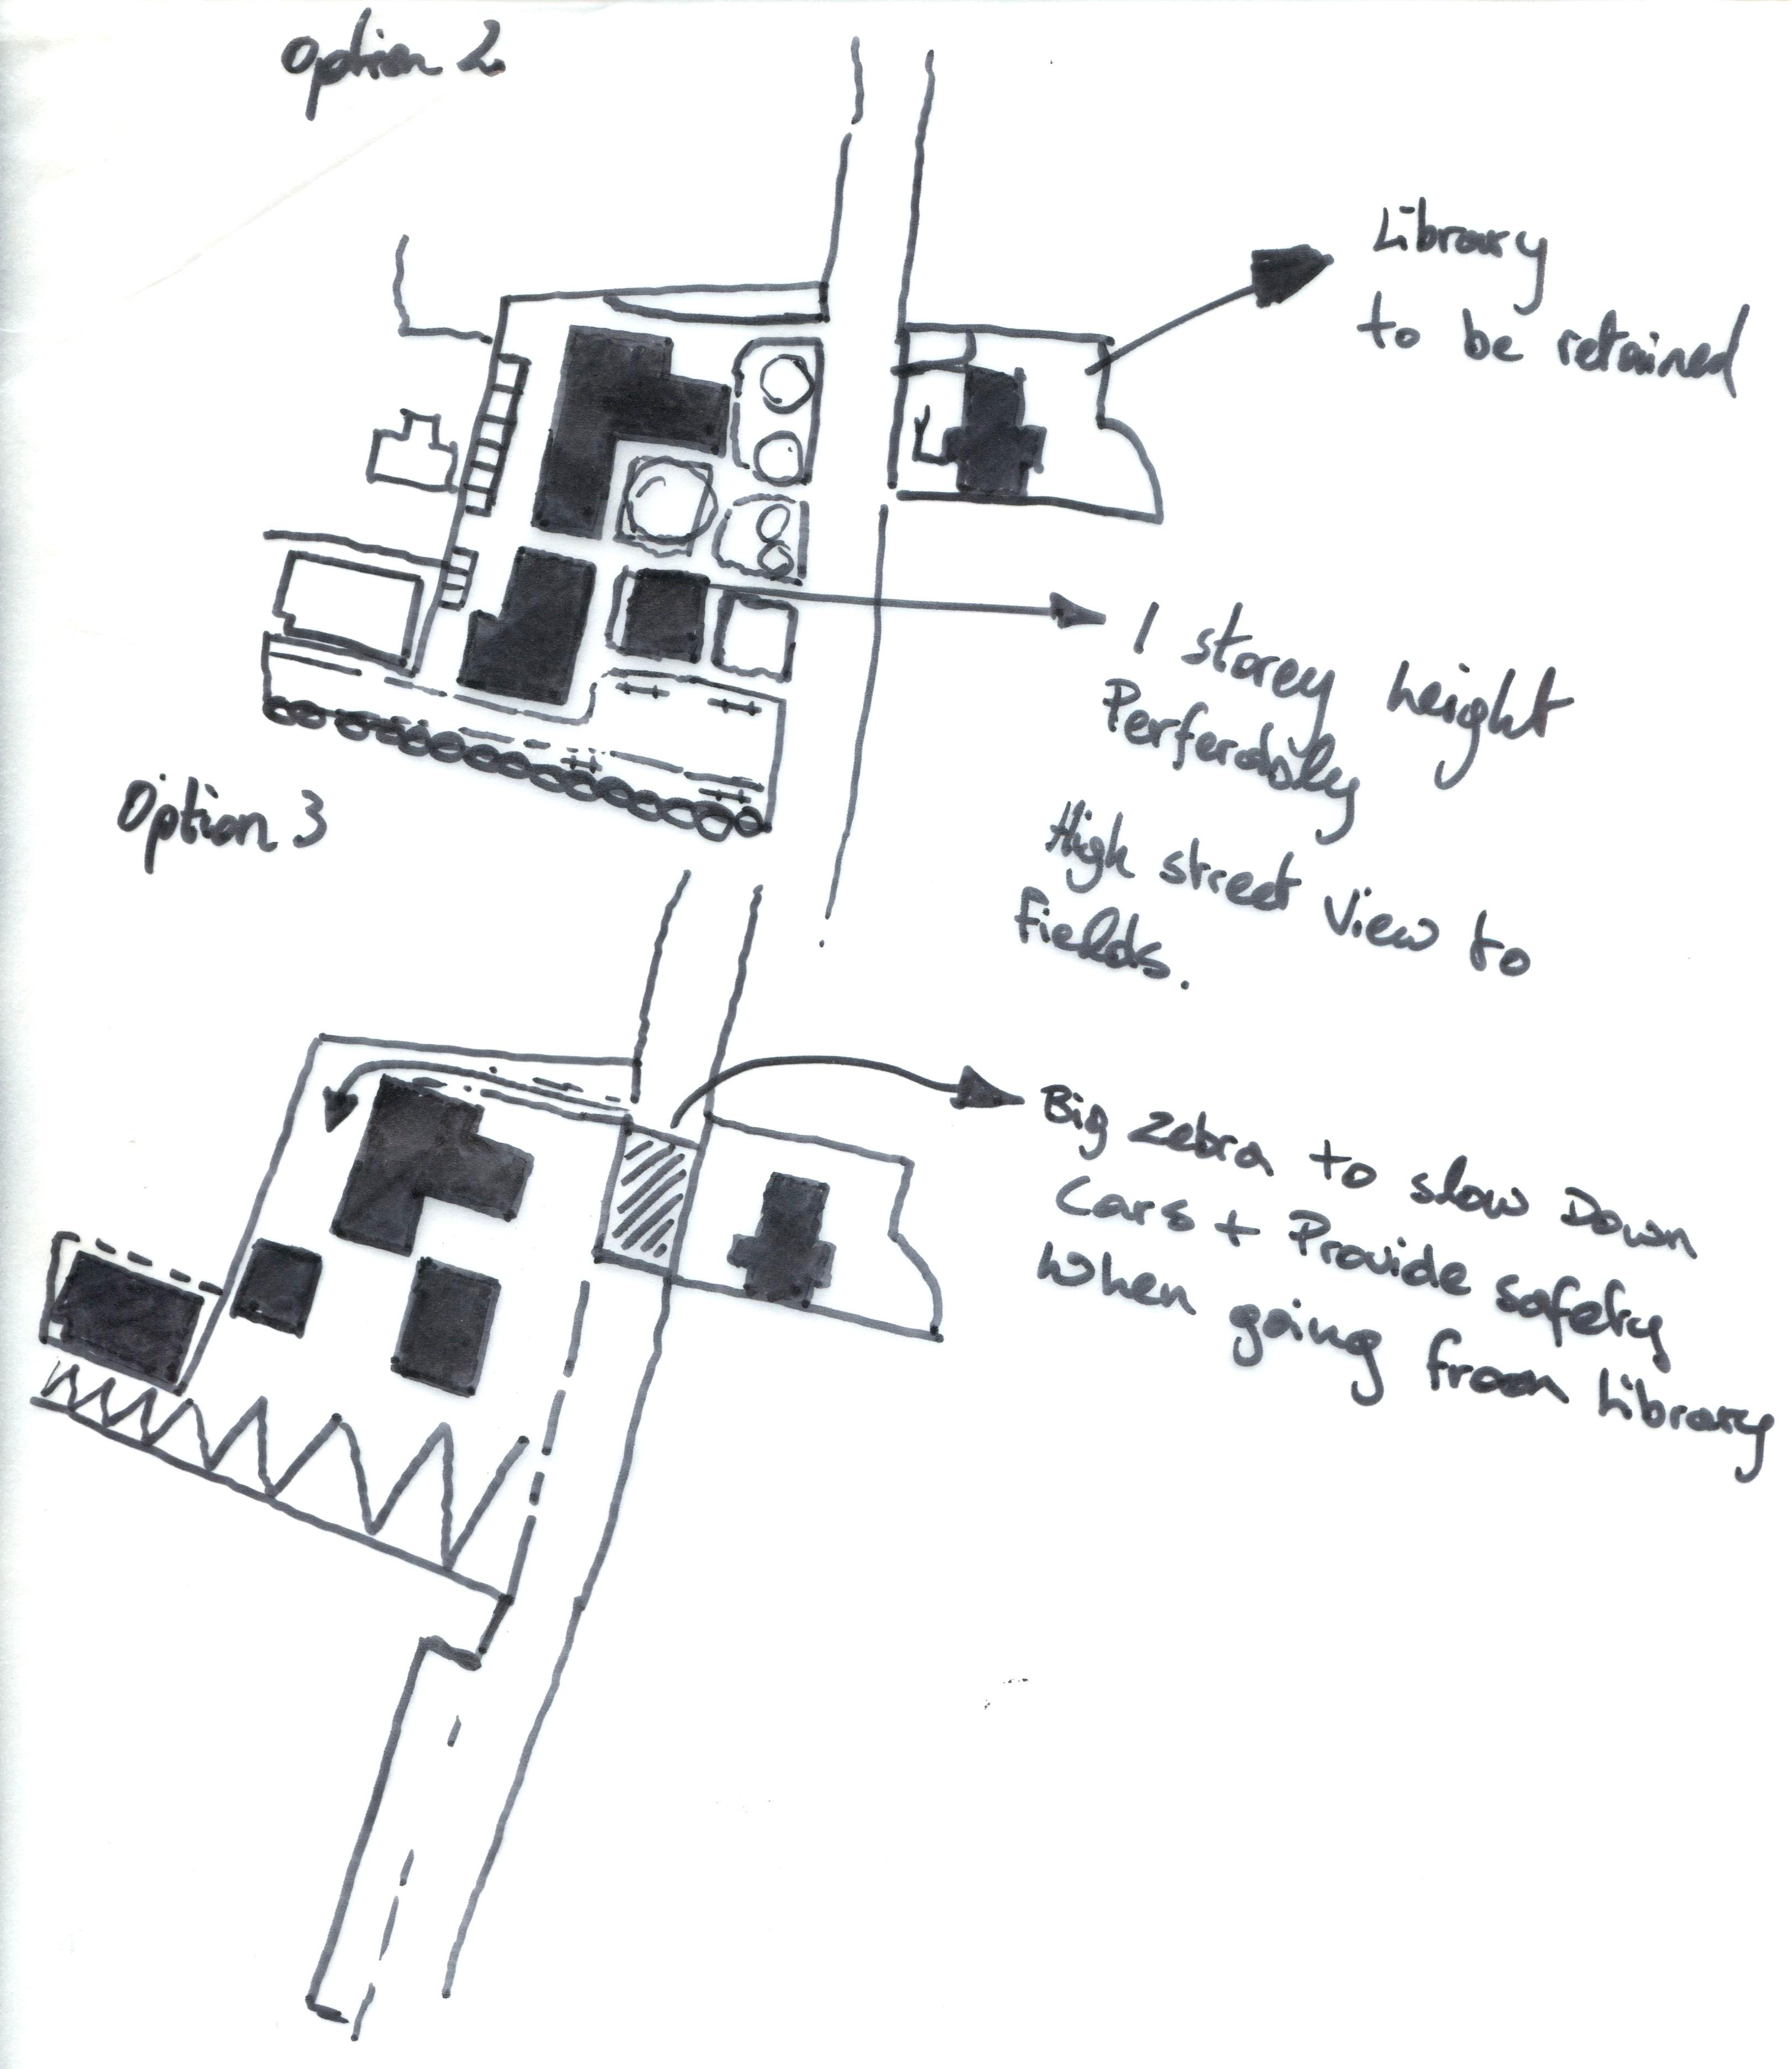 Design Proposal Option 2/3